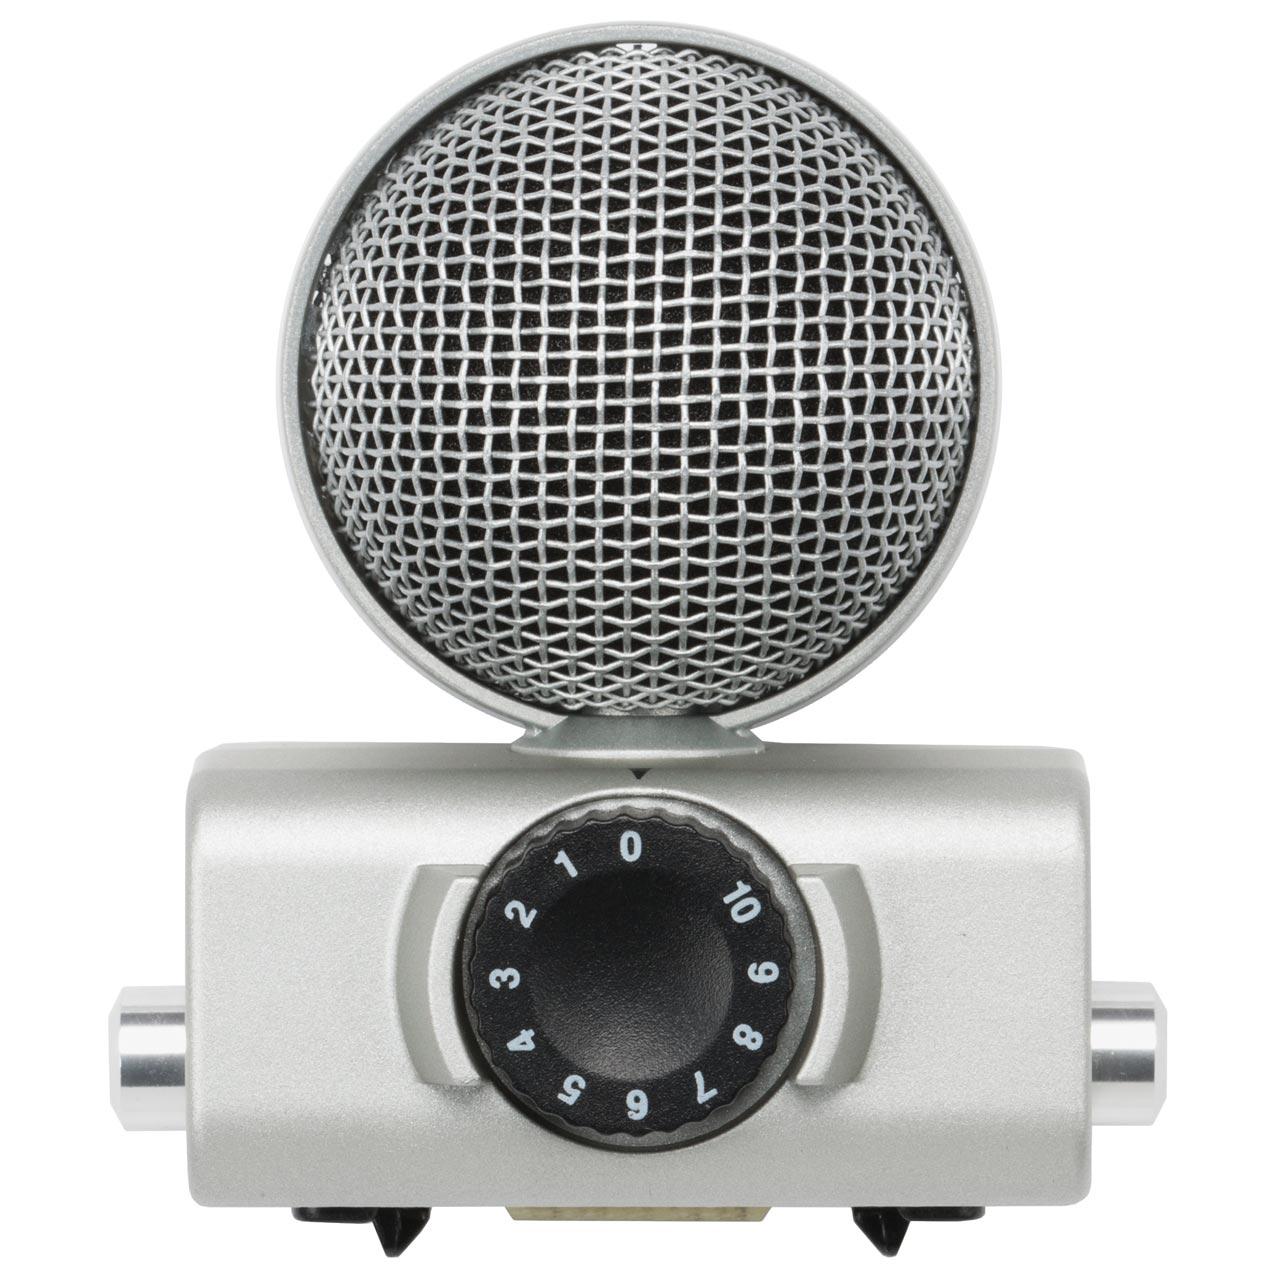 ZOOM H6 휴대용 디지털 레코더 ASMR MSH-6 멀티 채널 SLR, MSH-6 무 지향성 헤드셋